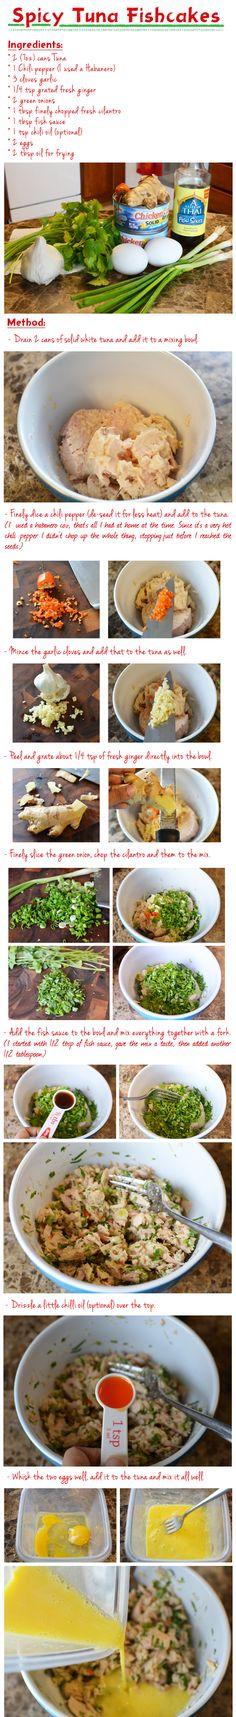 Spicy Tuna Fishcakes Recipe [Part 1]